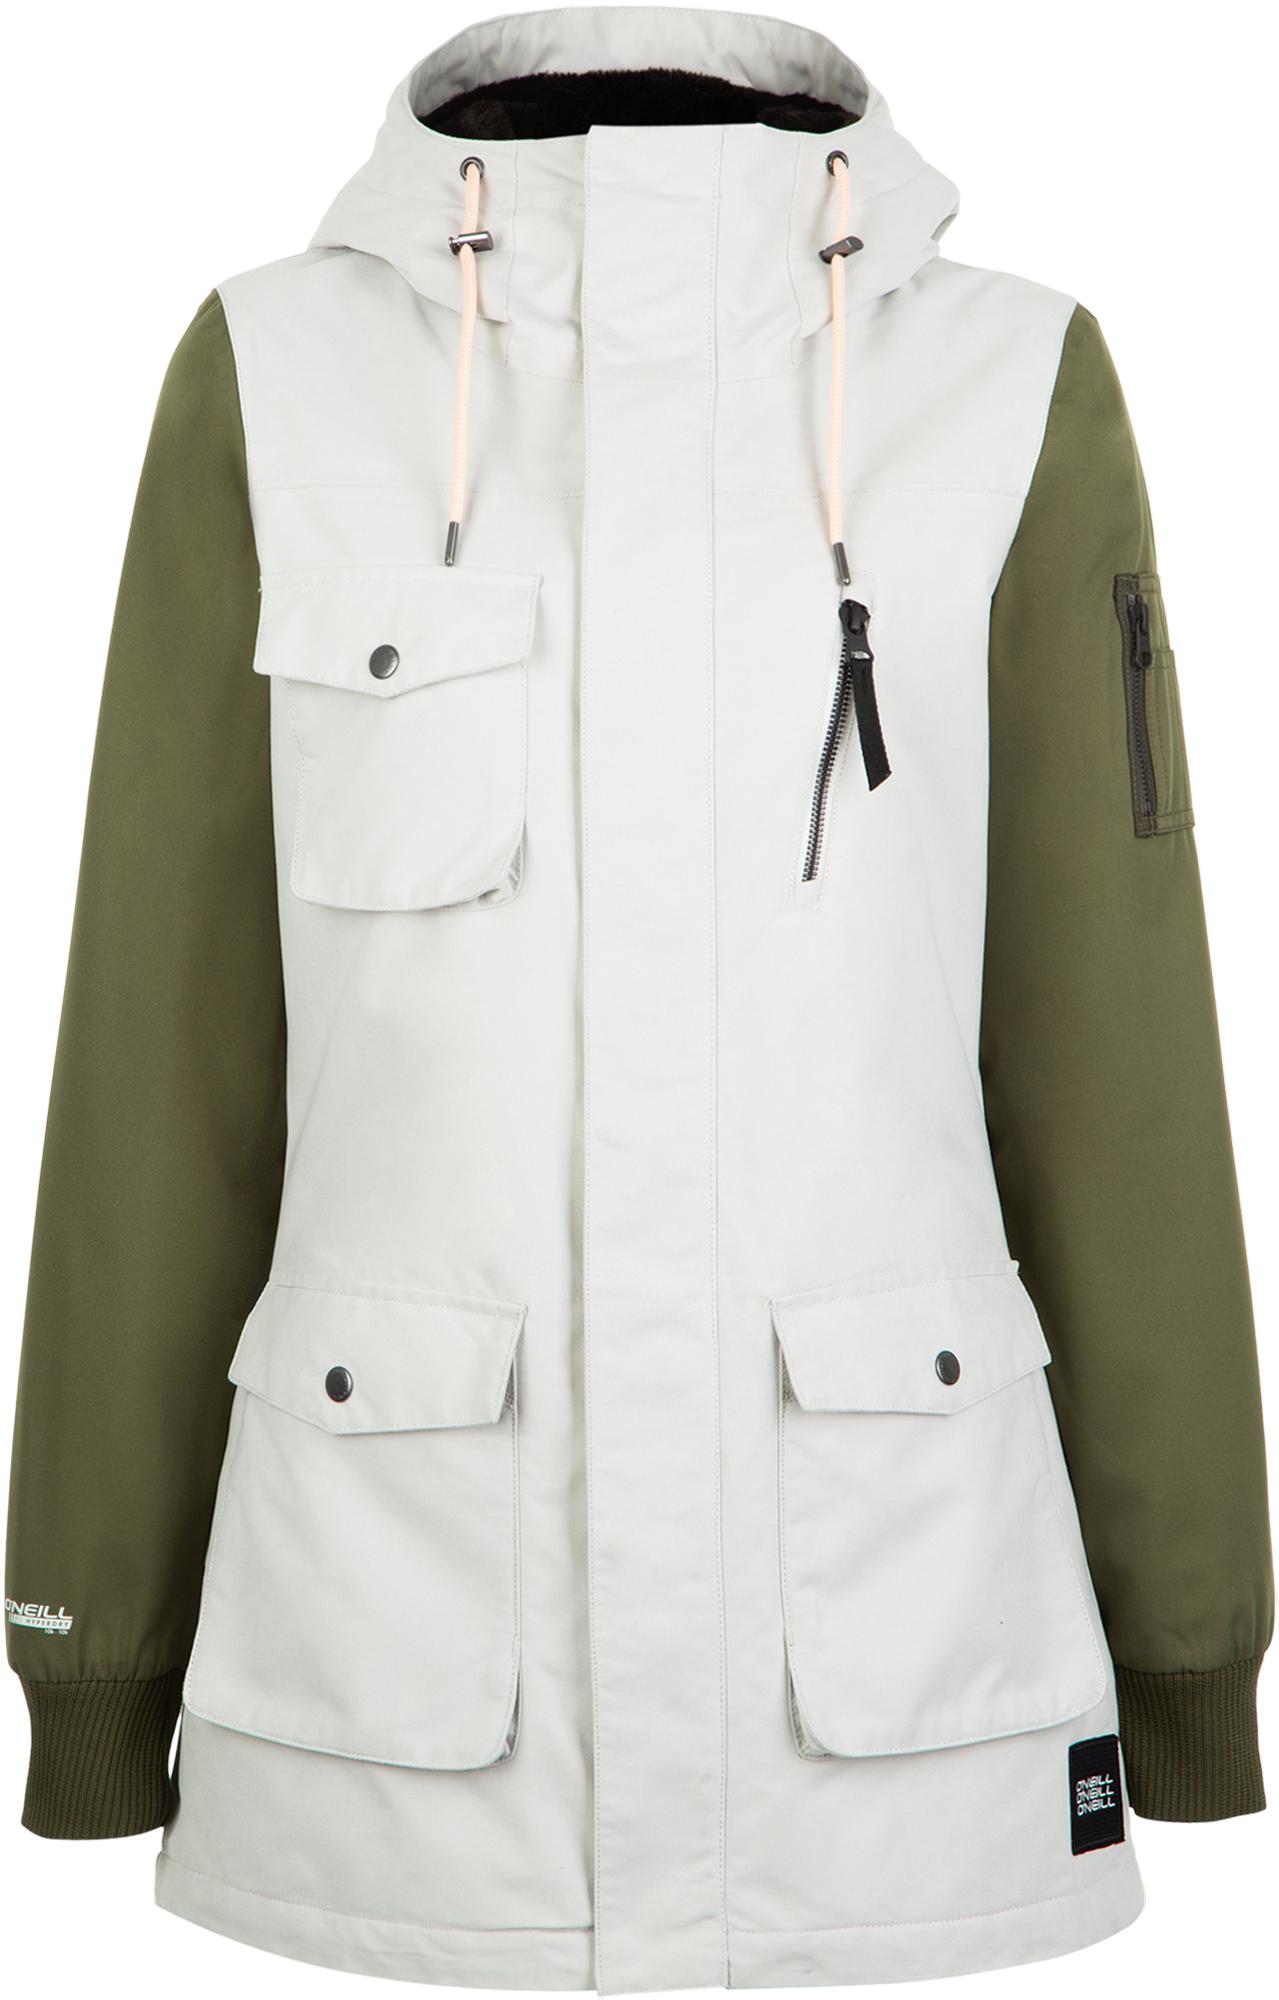 O'Neill Куртка утепленная женская O'Neill Pw Cylonite, размер 46-48 o neill куртка утепленная женская o neill pw hybrid cluster iii размер 48 50